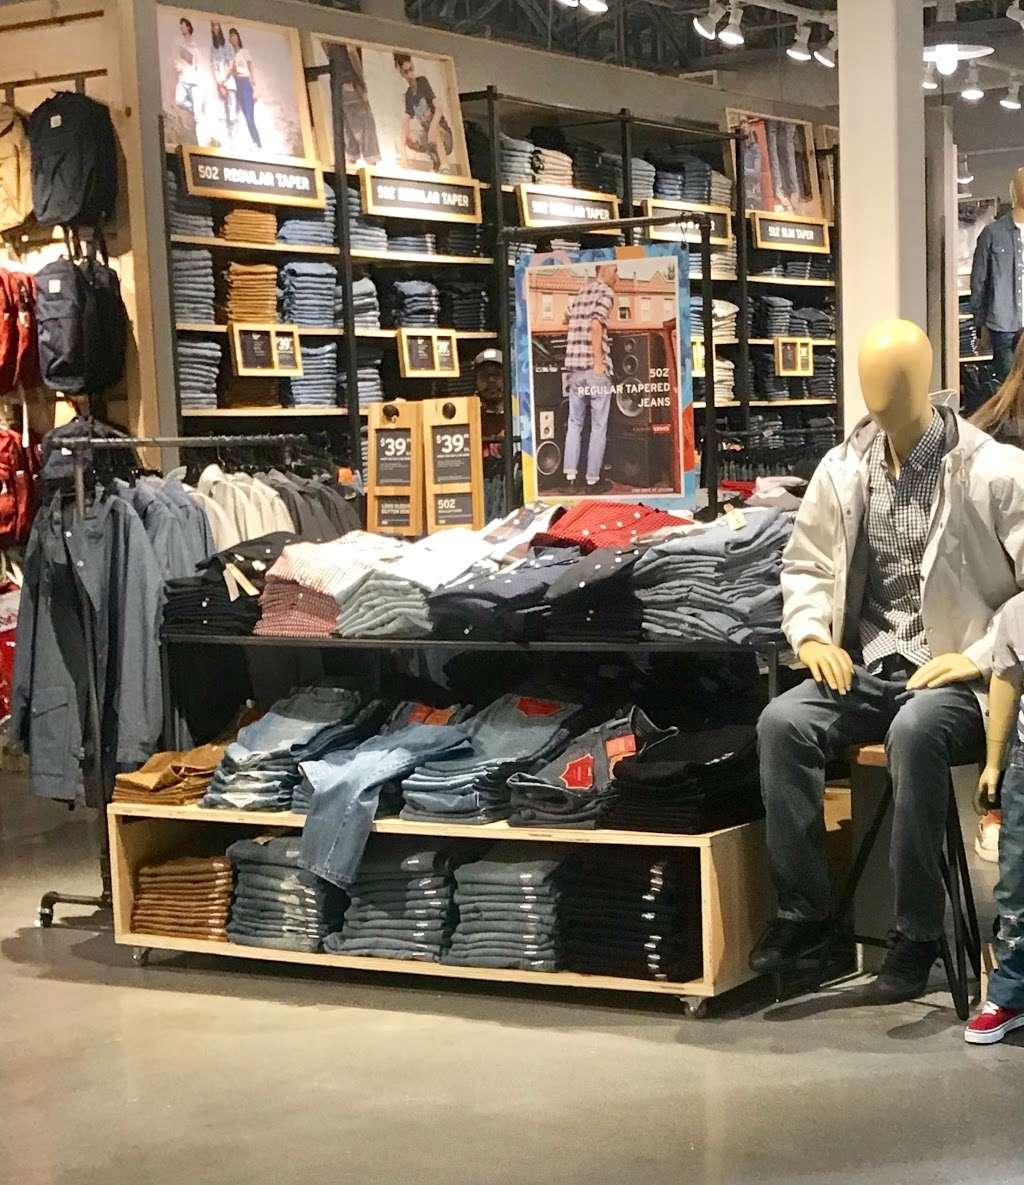 Levis Outlet Store at Jersey Gardens - clothing store  | Photo 5 of 9 | Address: 651 Kapkowski Rd #1224, Elizabeth, NJ 07201, USA | Phone: (908) 289-2233